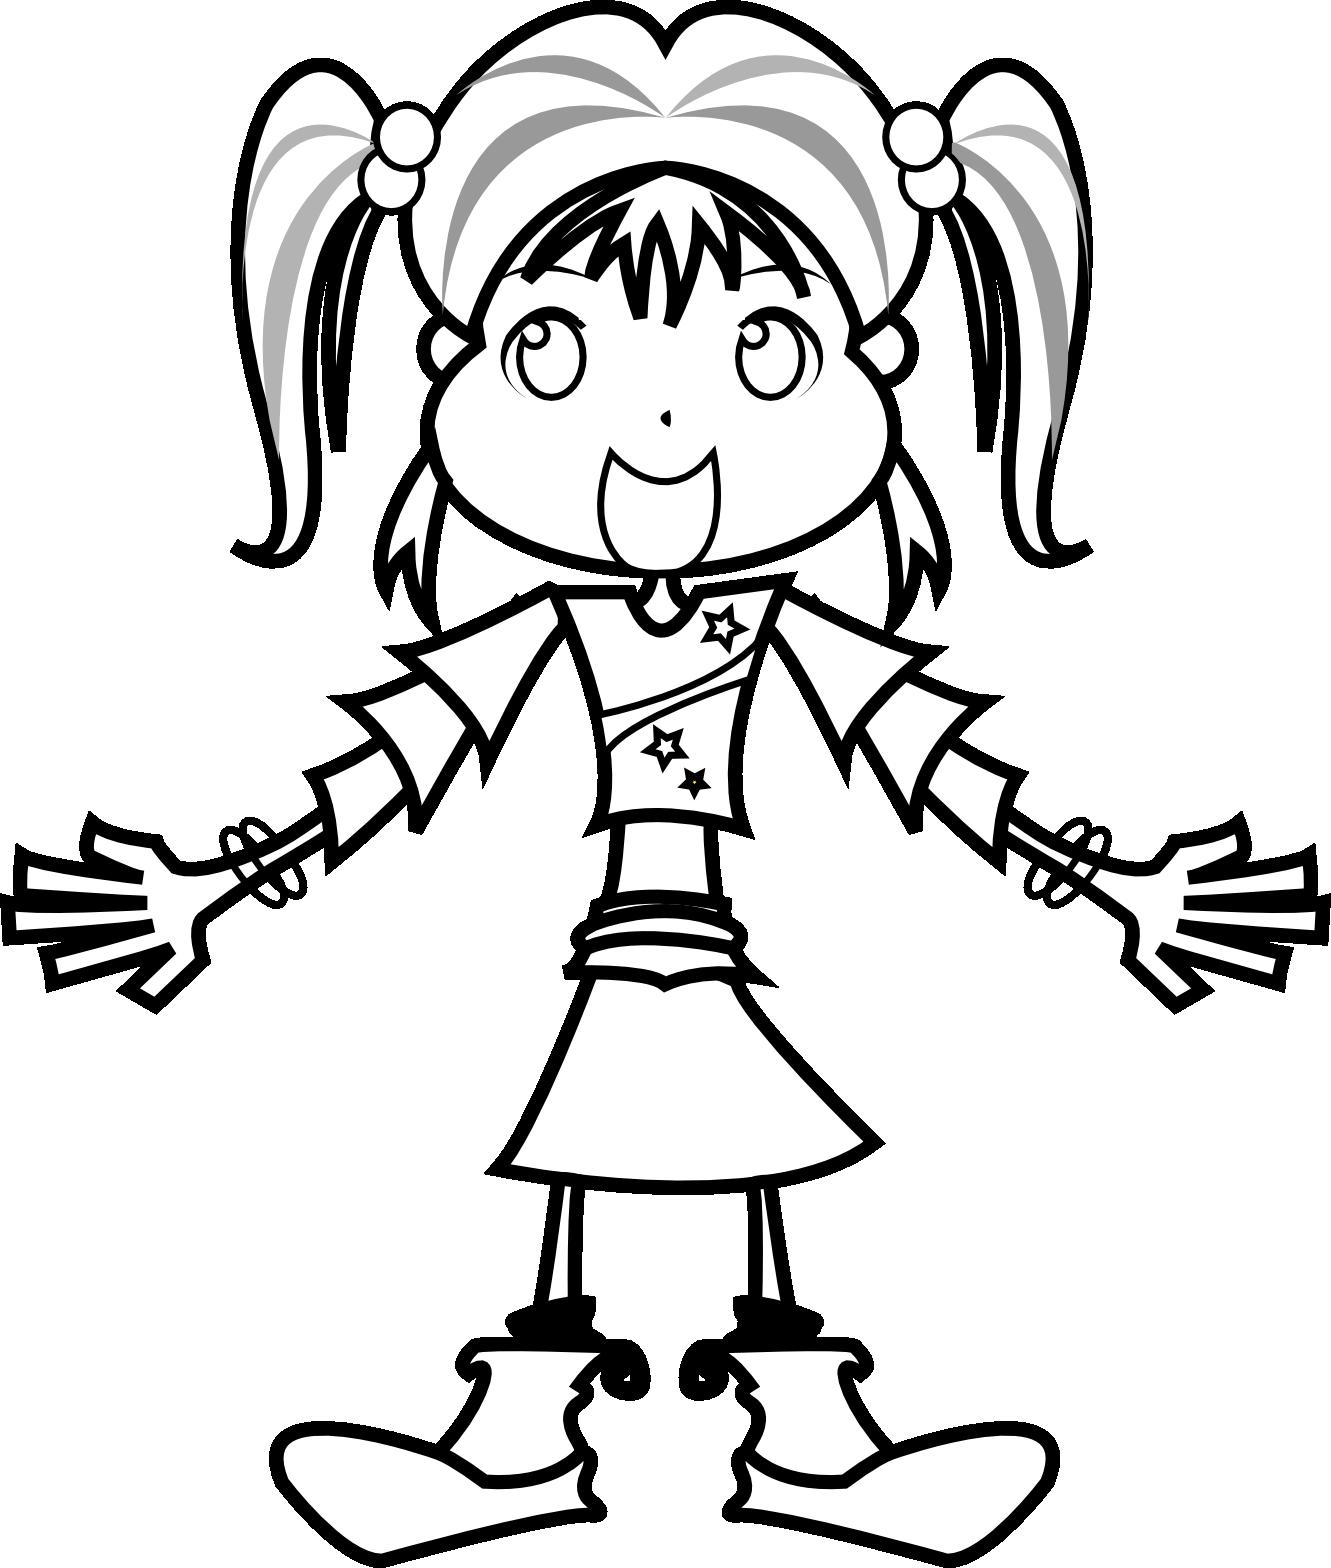 Teenage girl body clipart black and white banner black and white stock Free Black Teen Cliparts, Download Free Clip Art, Free Clip ... banner black and white stock